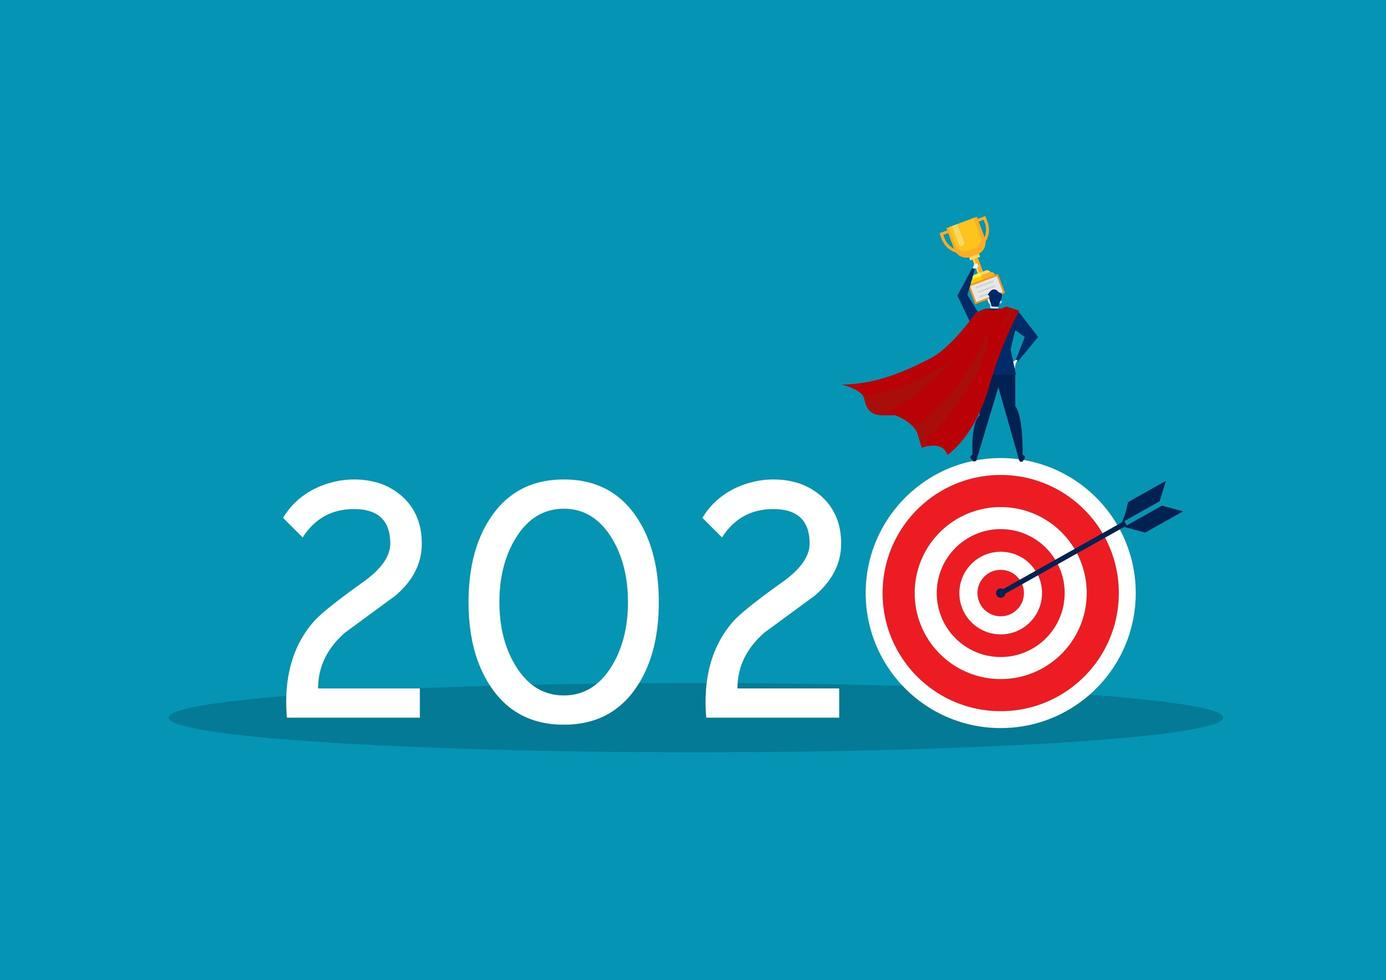 superhjälte affärsman står på 2020 mål vektor